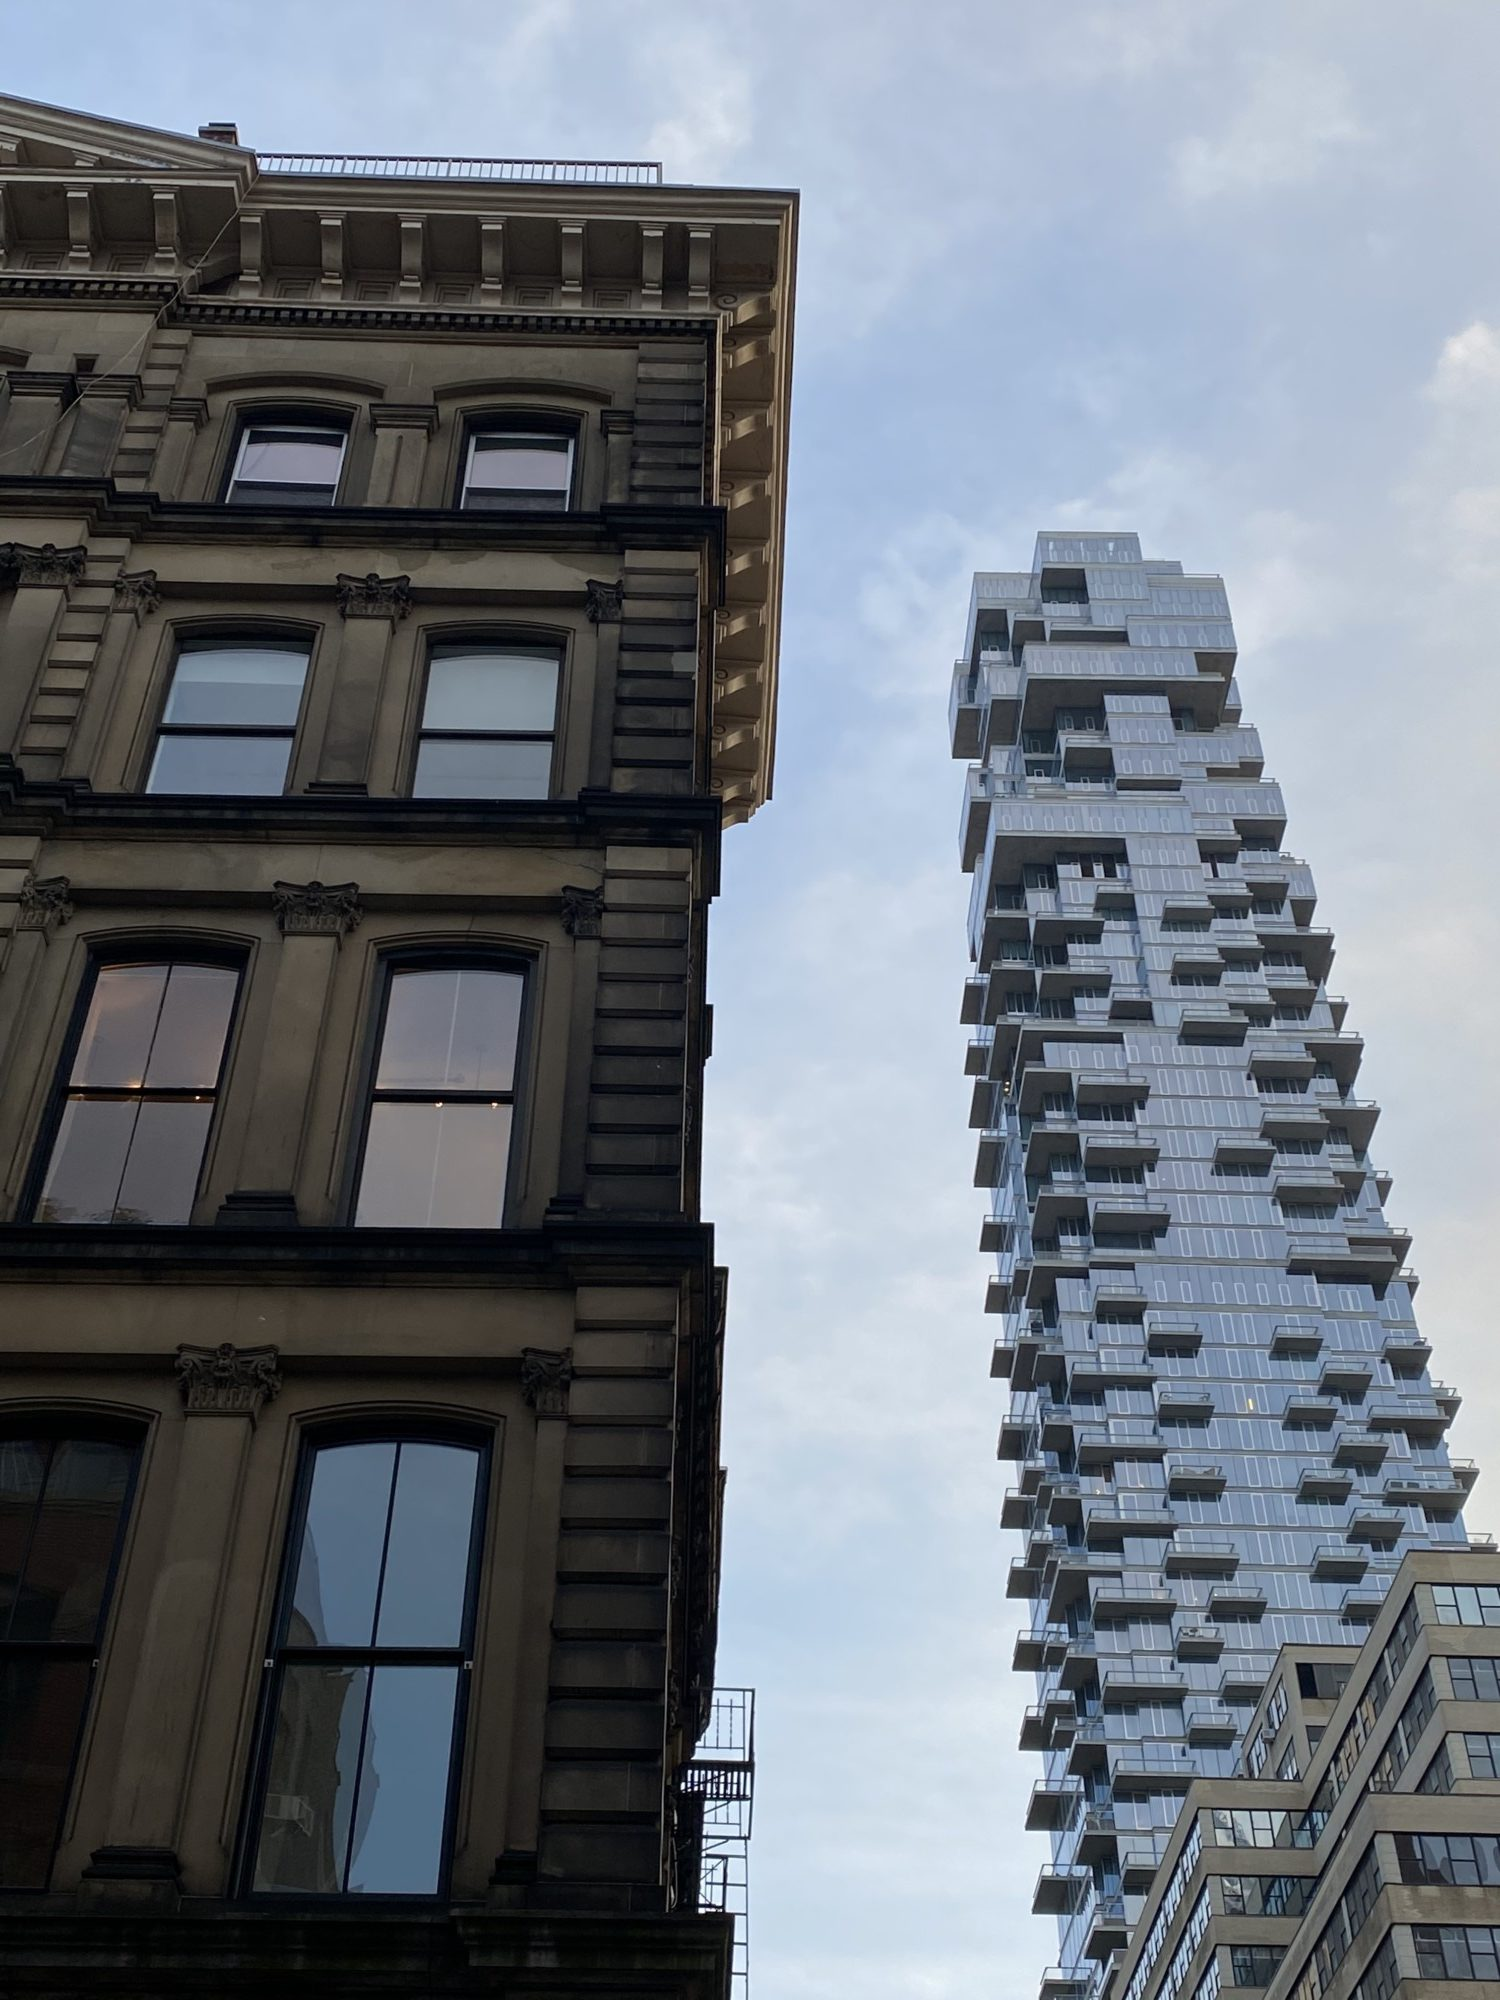 Pre-War vs. Post-War Buildings in NYC